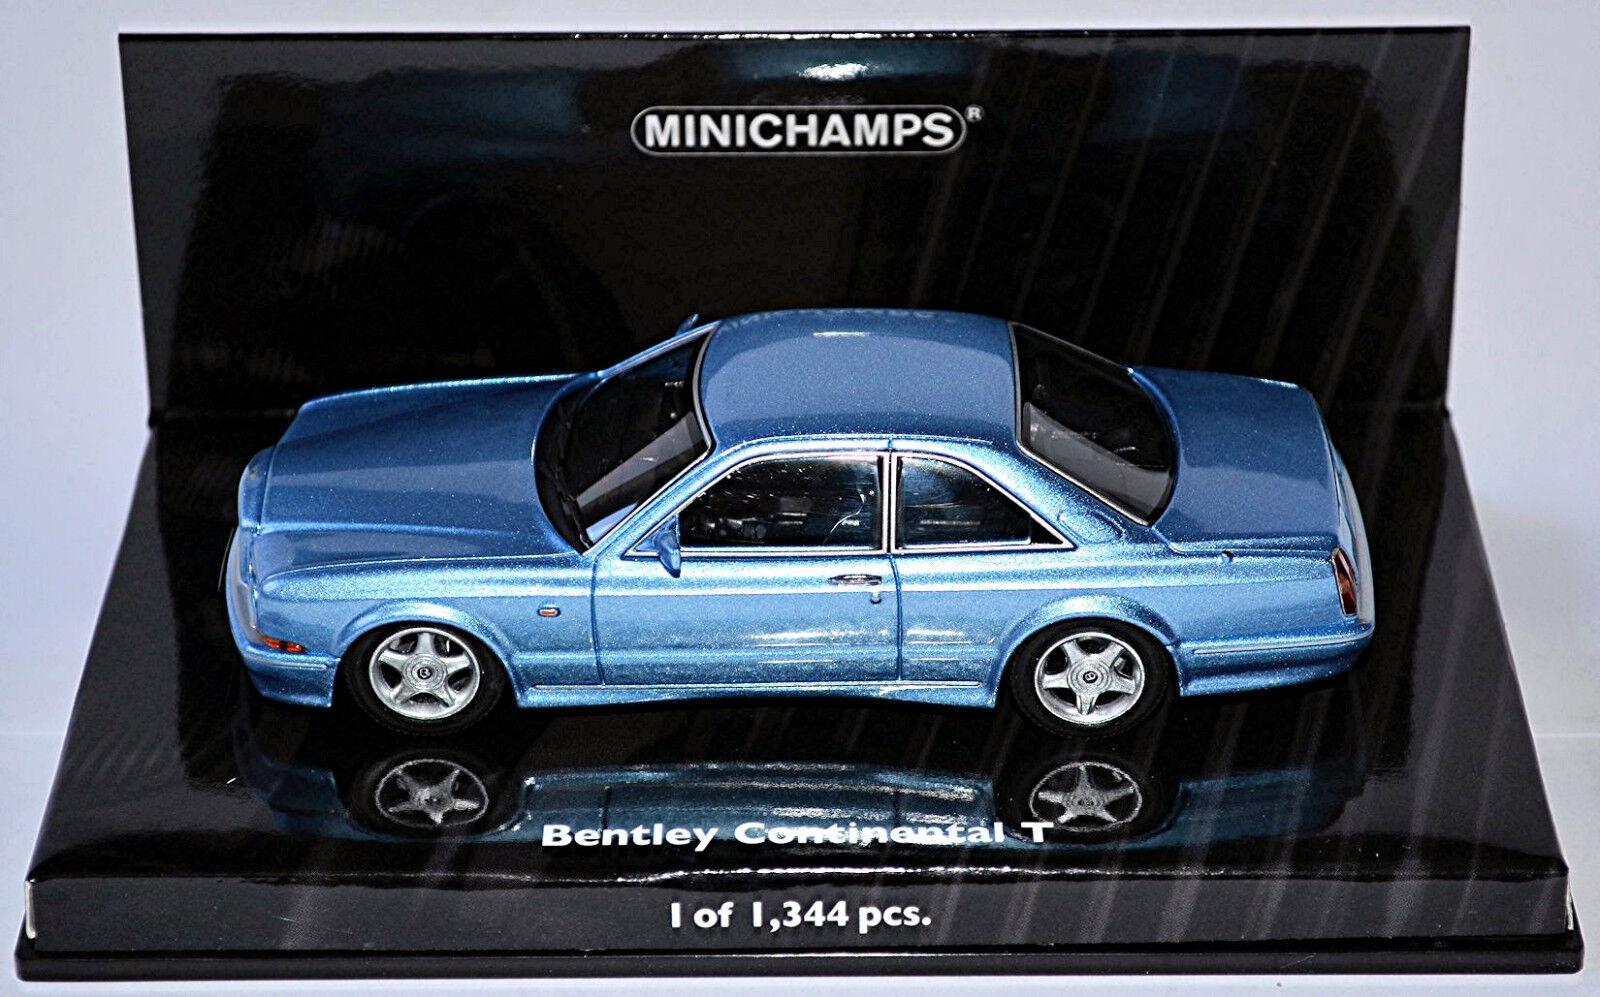 Bentley Continental T 1991-2002 Blu Mettuttiico 1 43 minichamps Lim.ed. 1,344